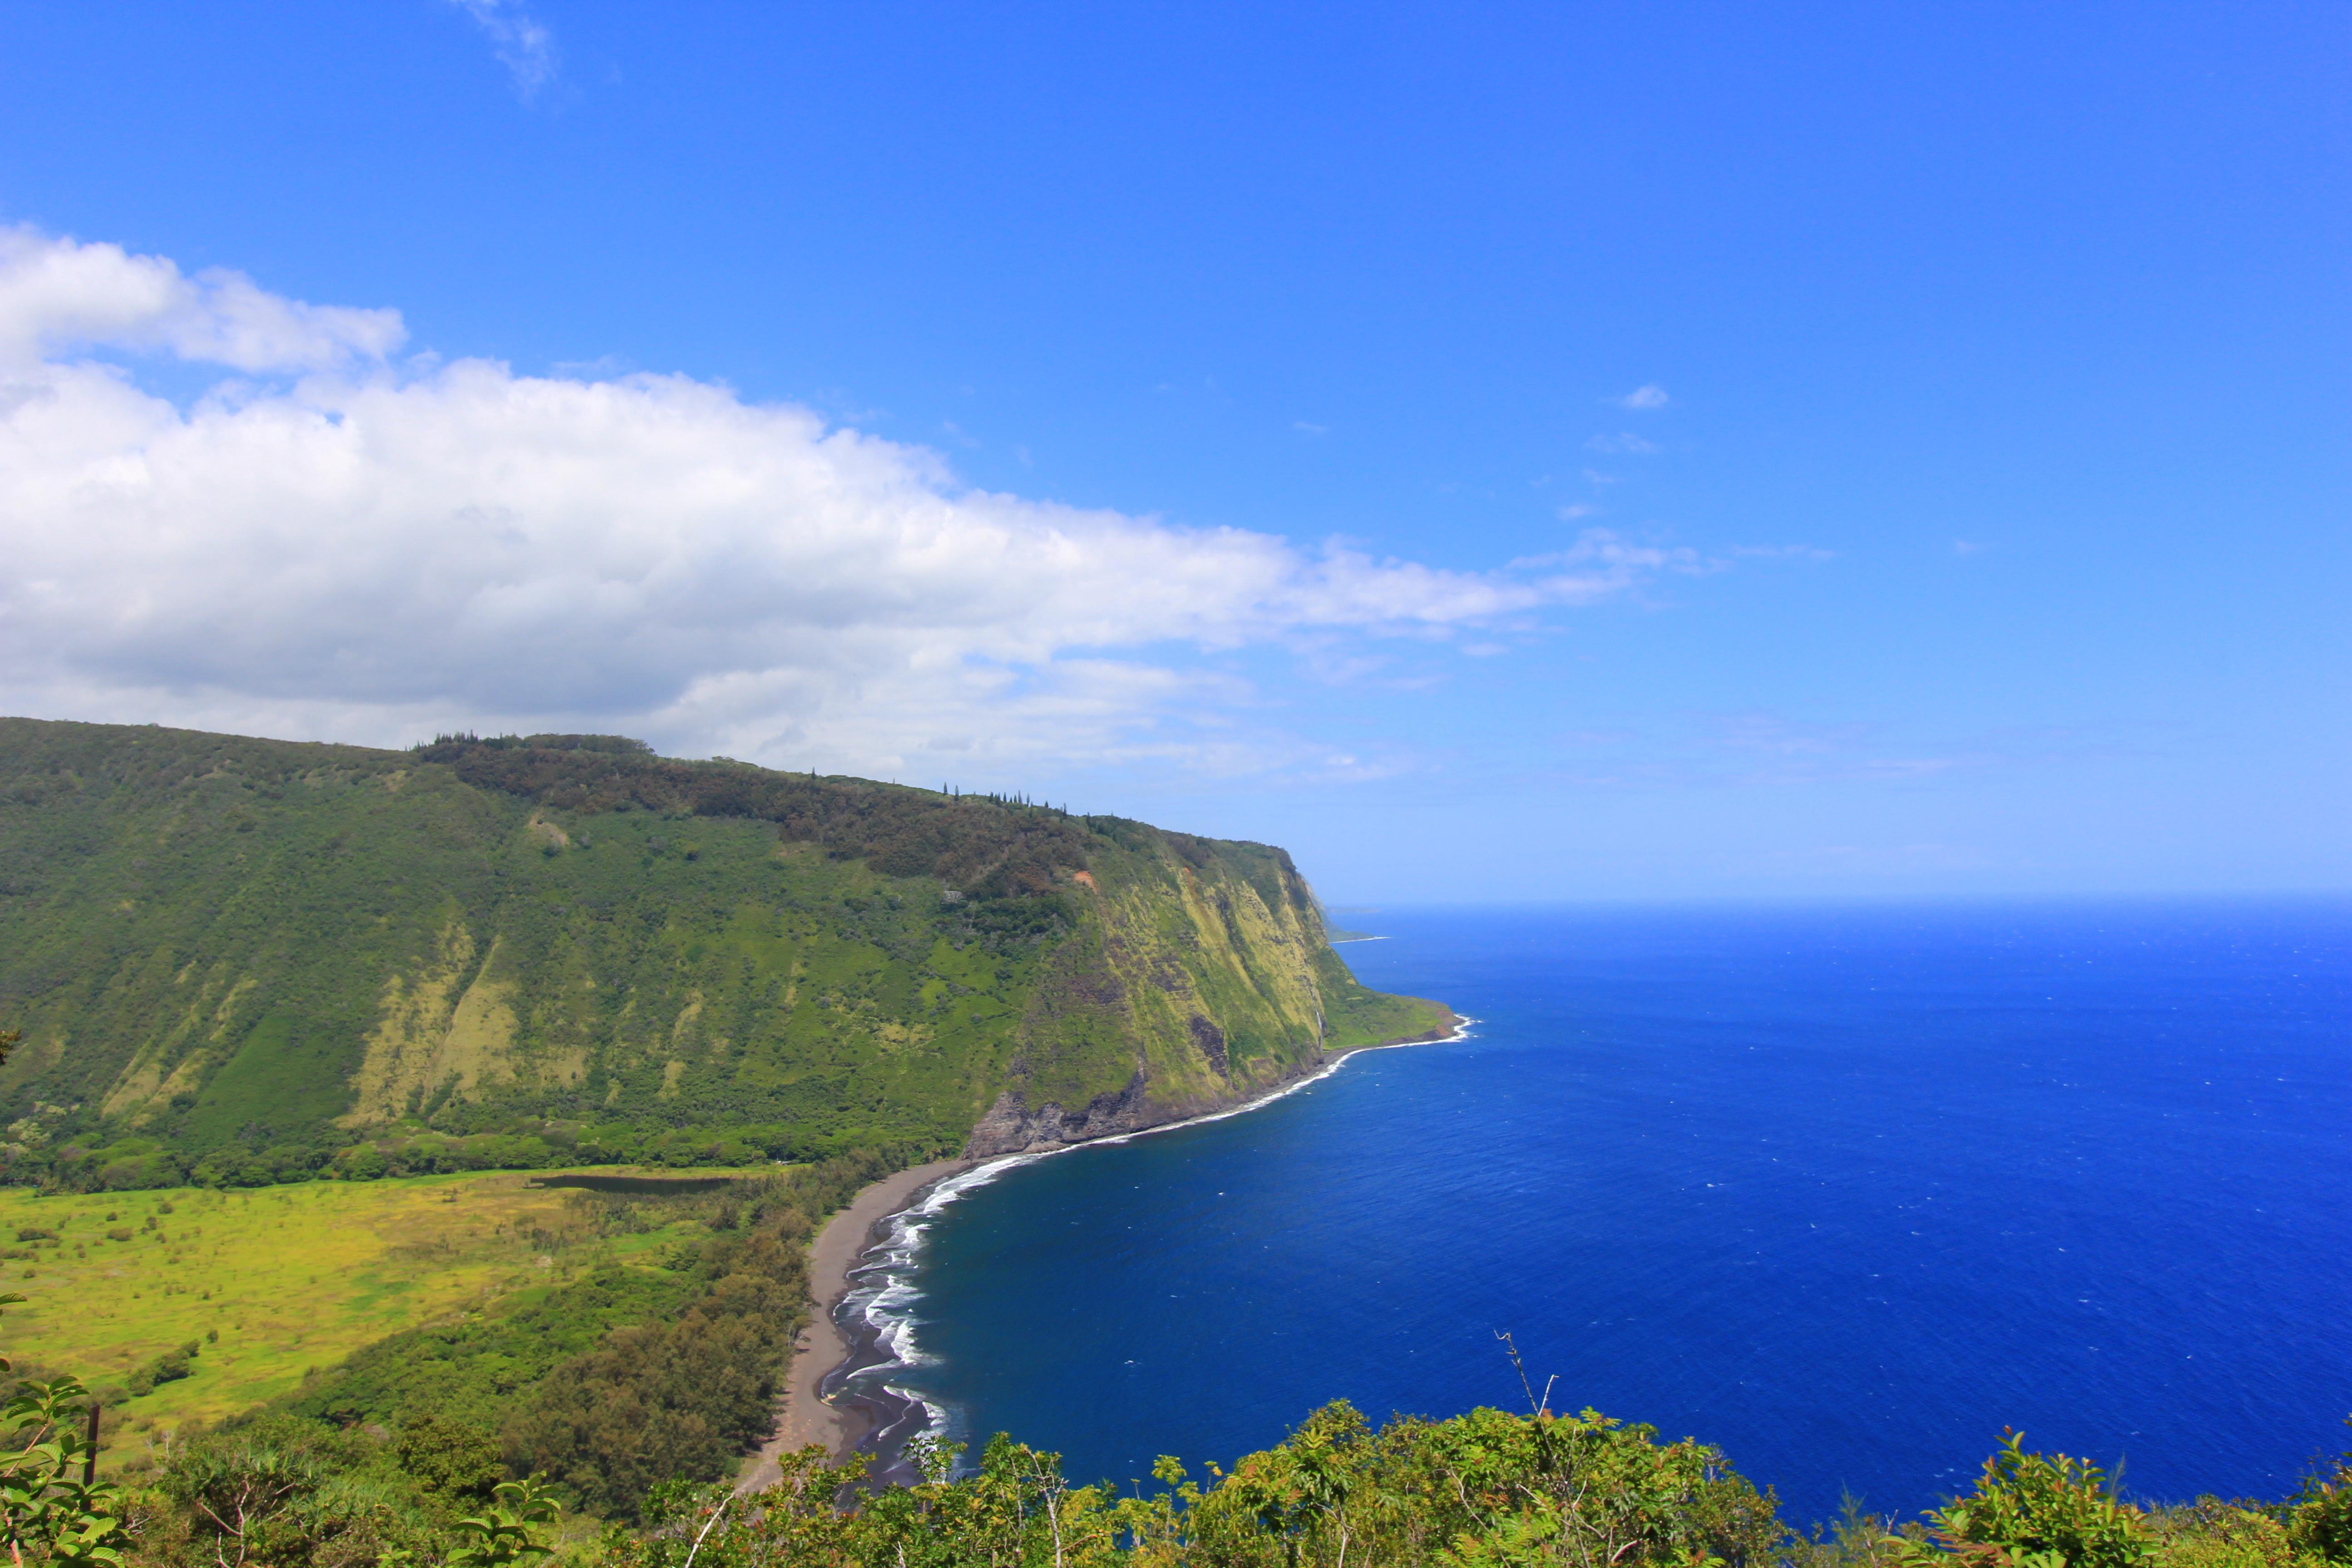 [Not Available] Kilauea Volcano & Maunakea Stargazing Tour